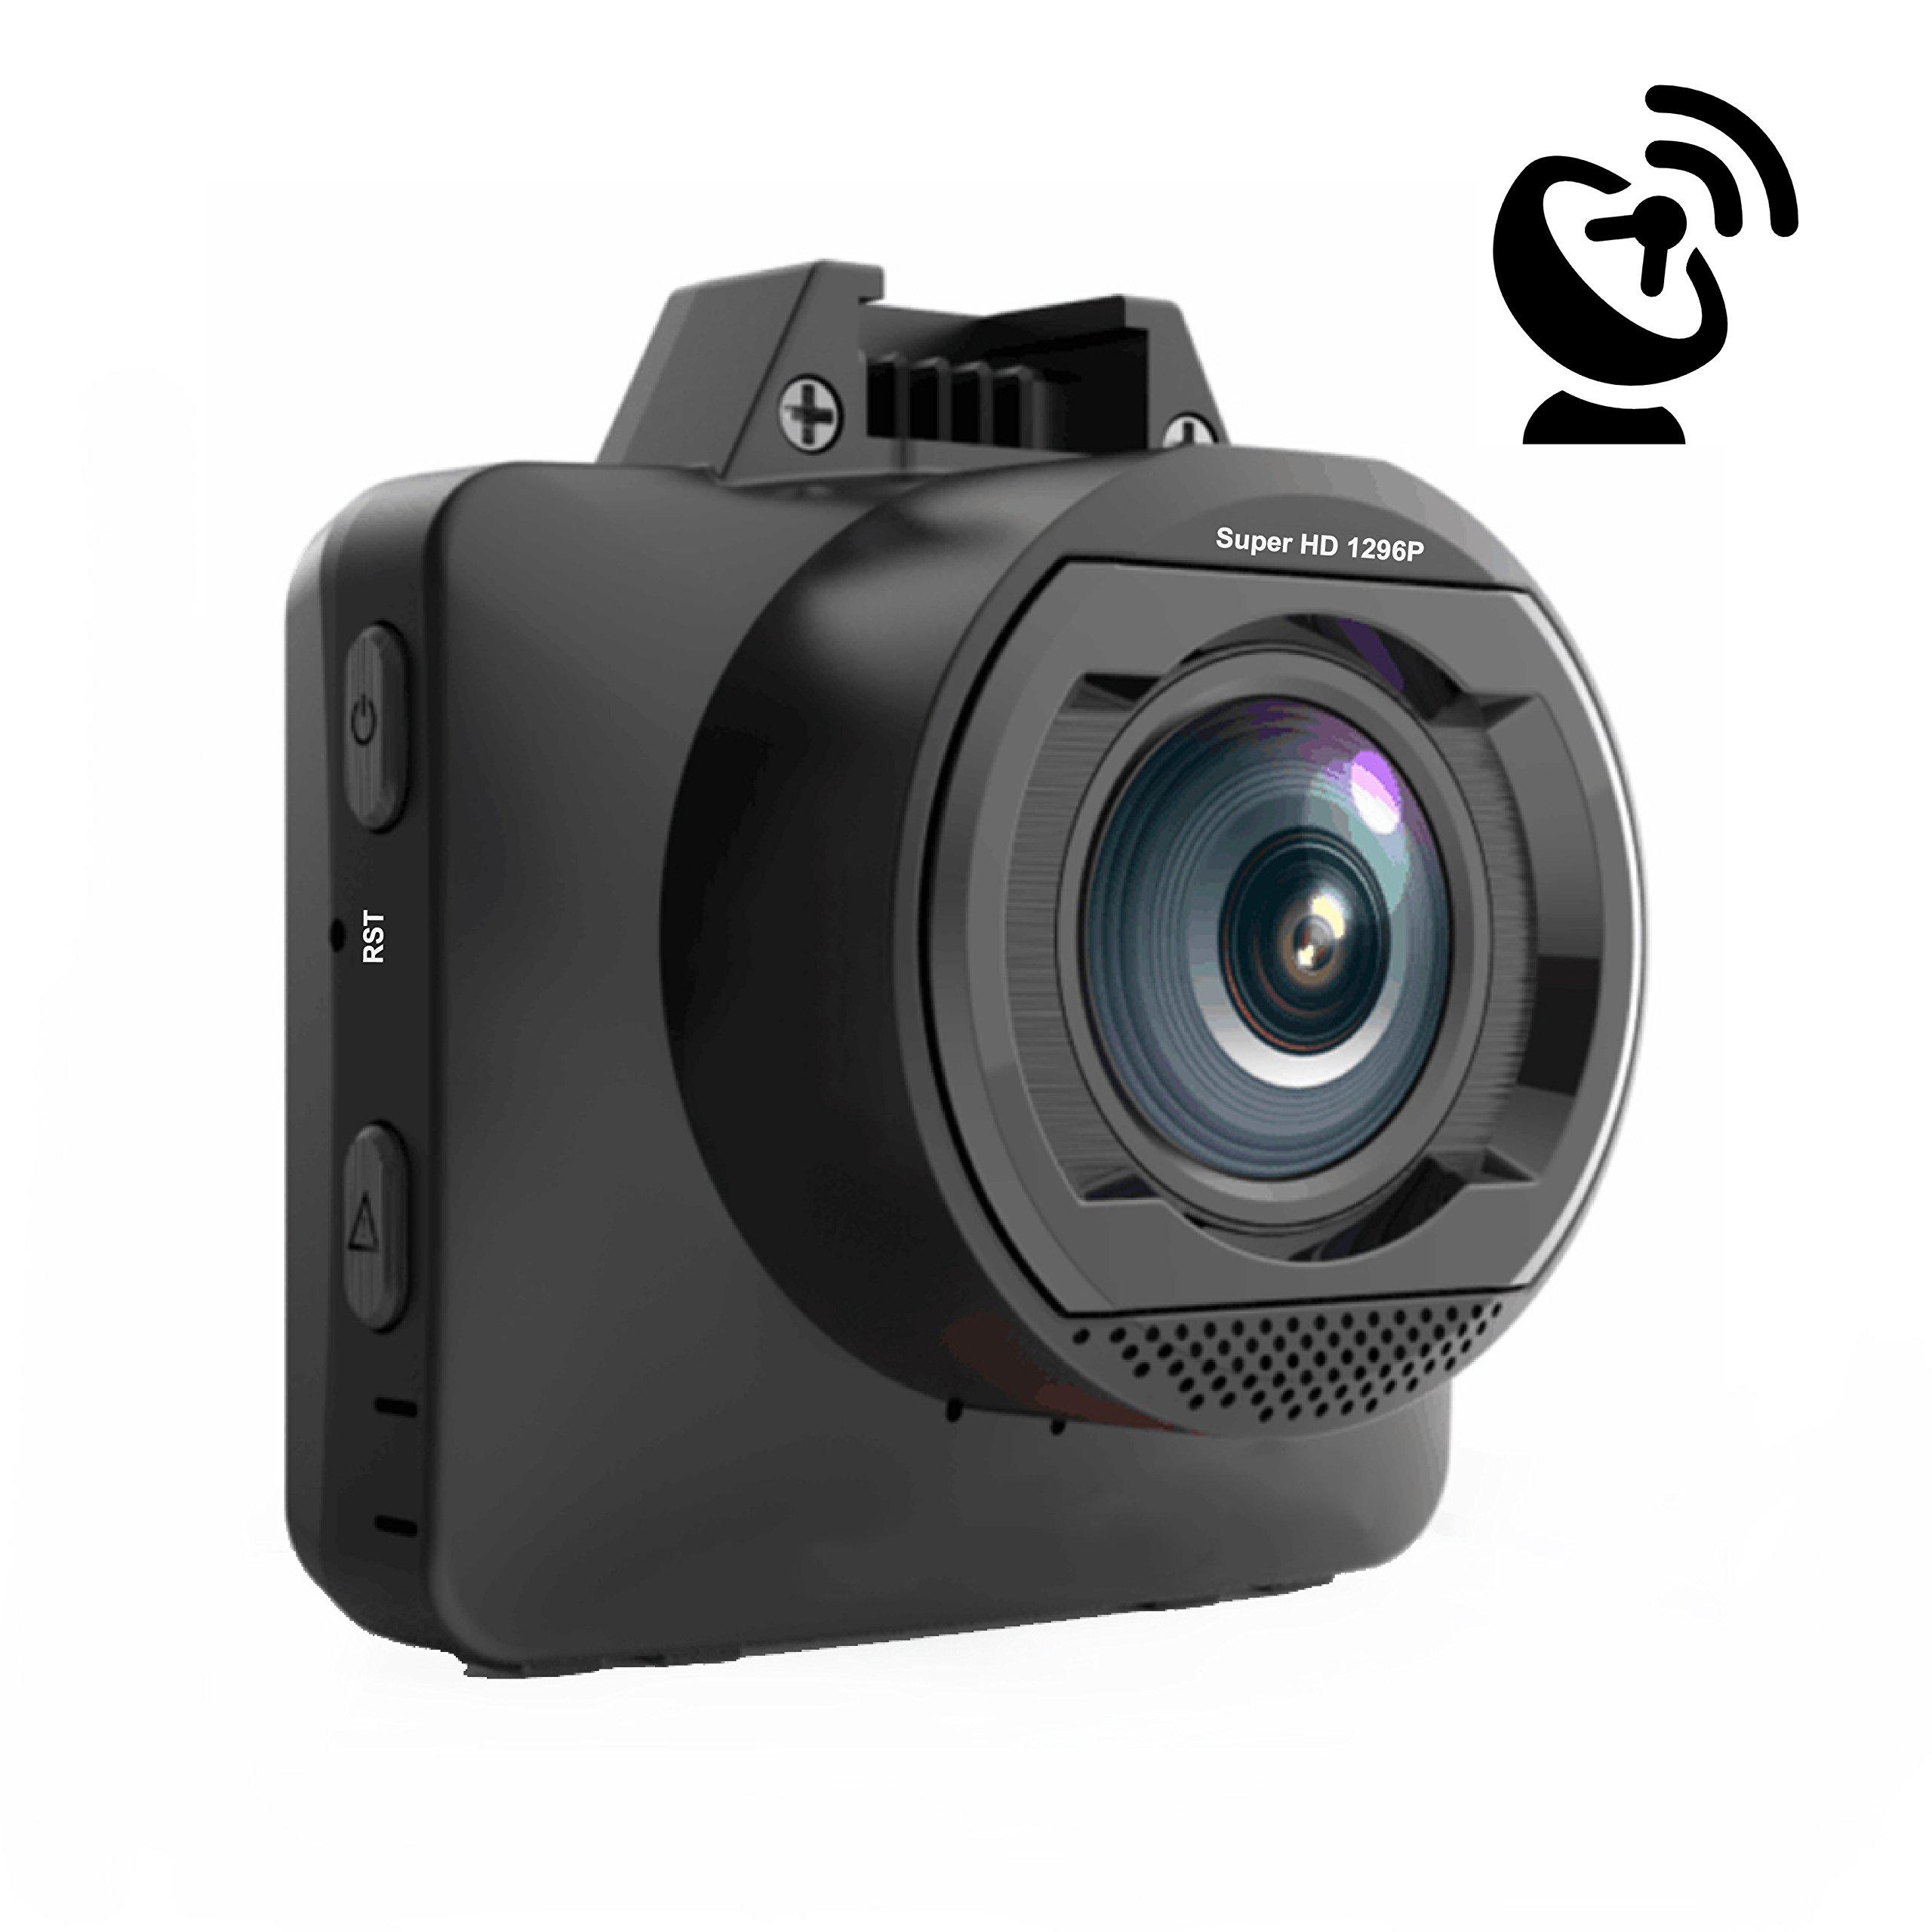 EBORN 170 Degree Dash Cam with GPS ,Mini 2 inch Vehicle Dashboard Camera Recorder DVR ,1296P 1080P Super HD,Night Vision,ADAS,Parking Monitor ,WDR